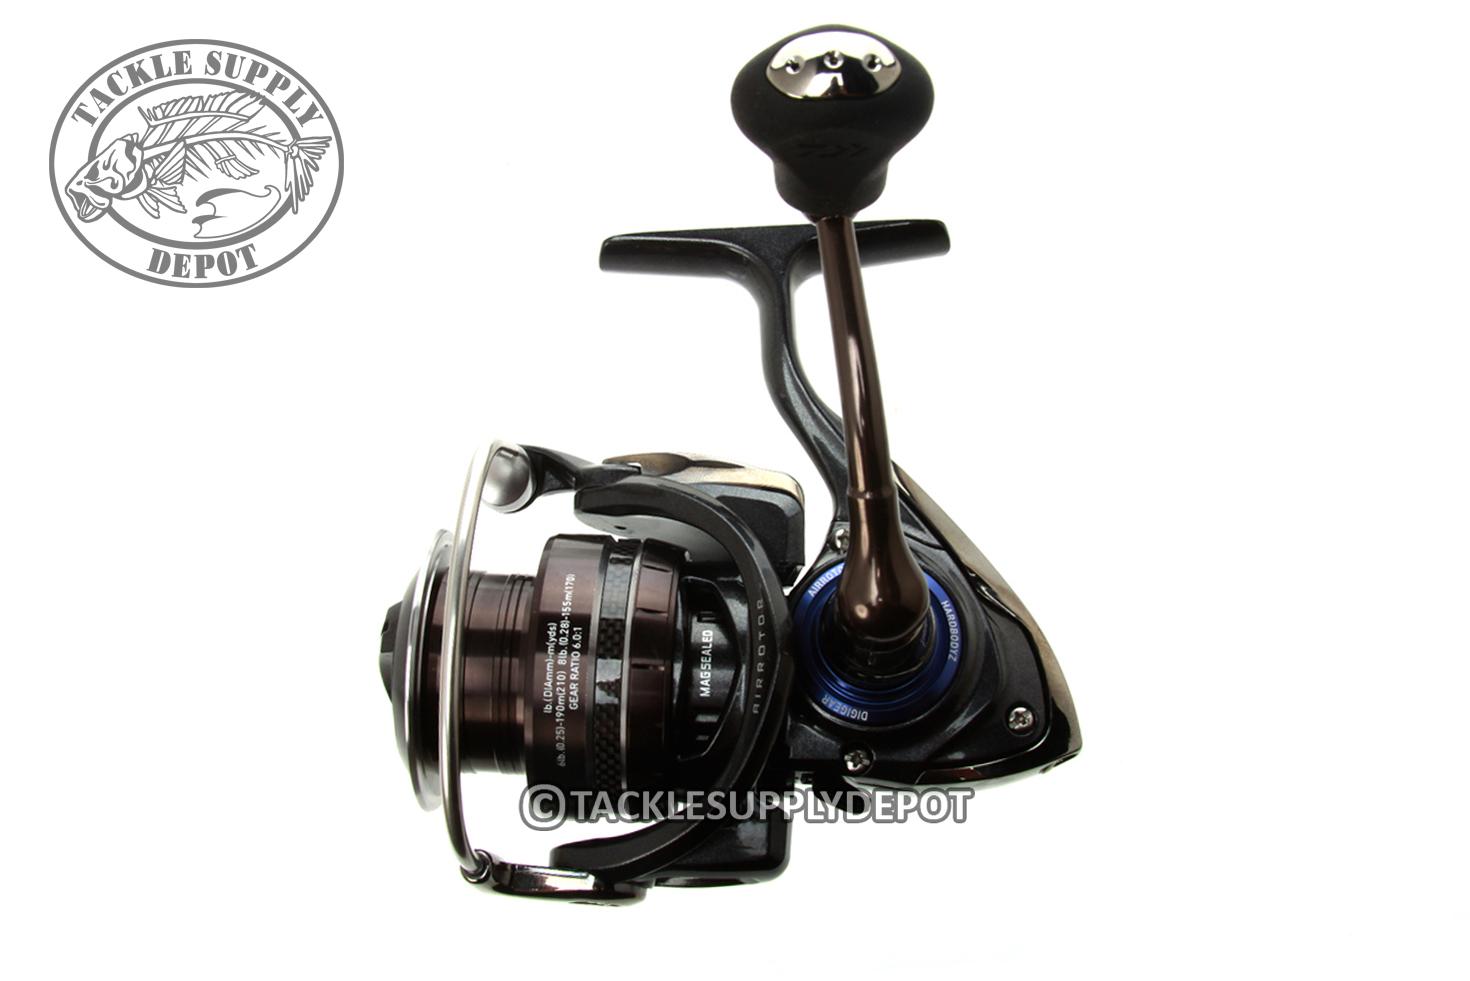 Daiwa procyon ex 6 0 1 spinning reel prex2500sh ebay for Purple fishing reel